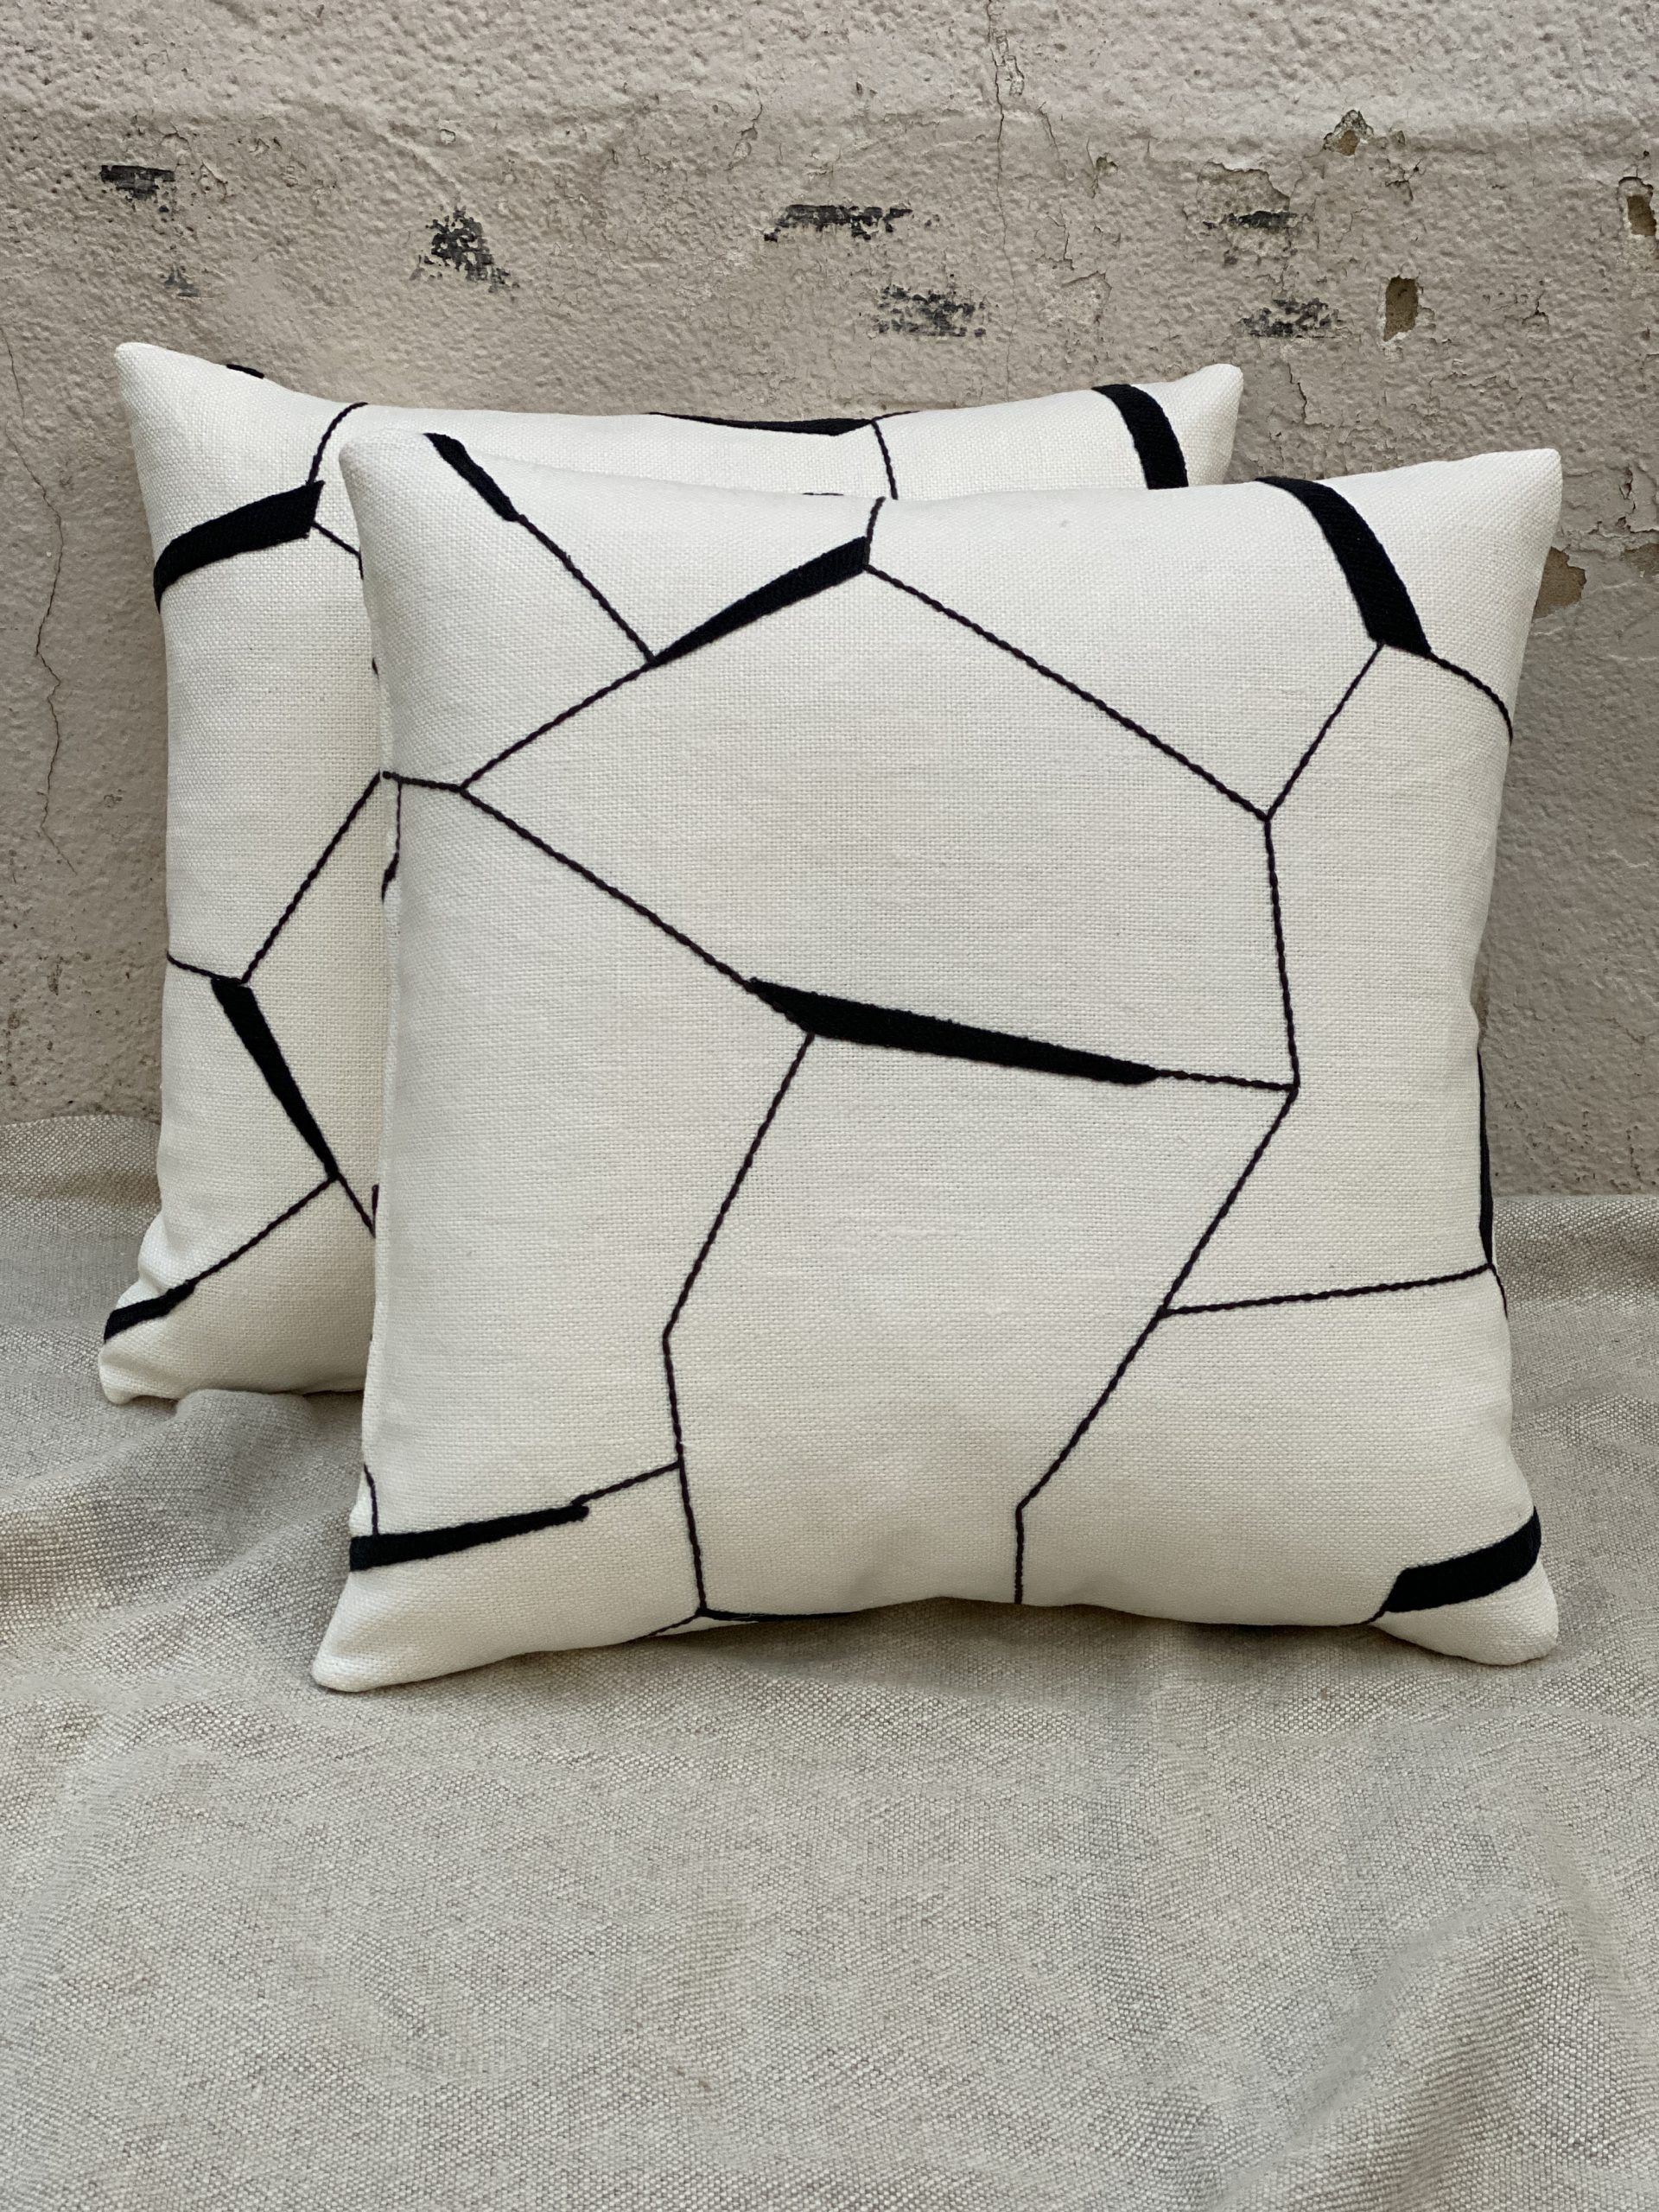 Kravet Couture Pillows